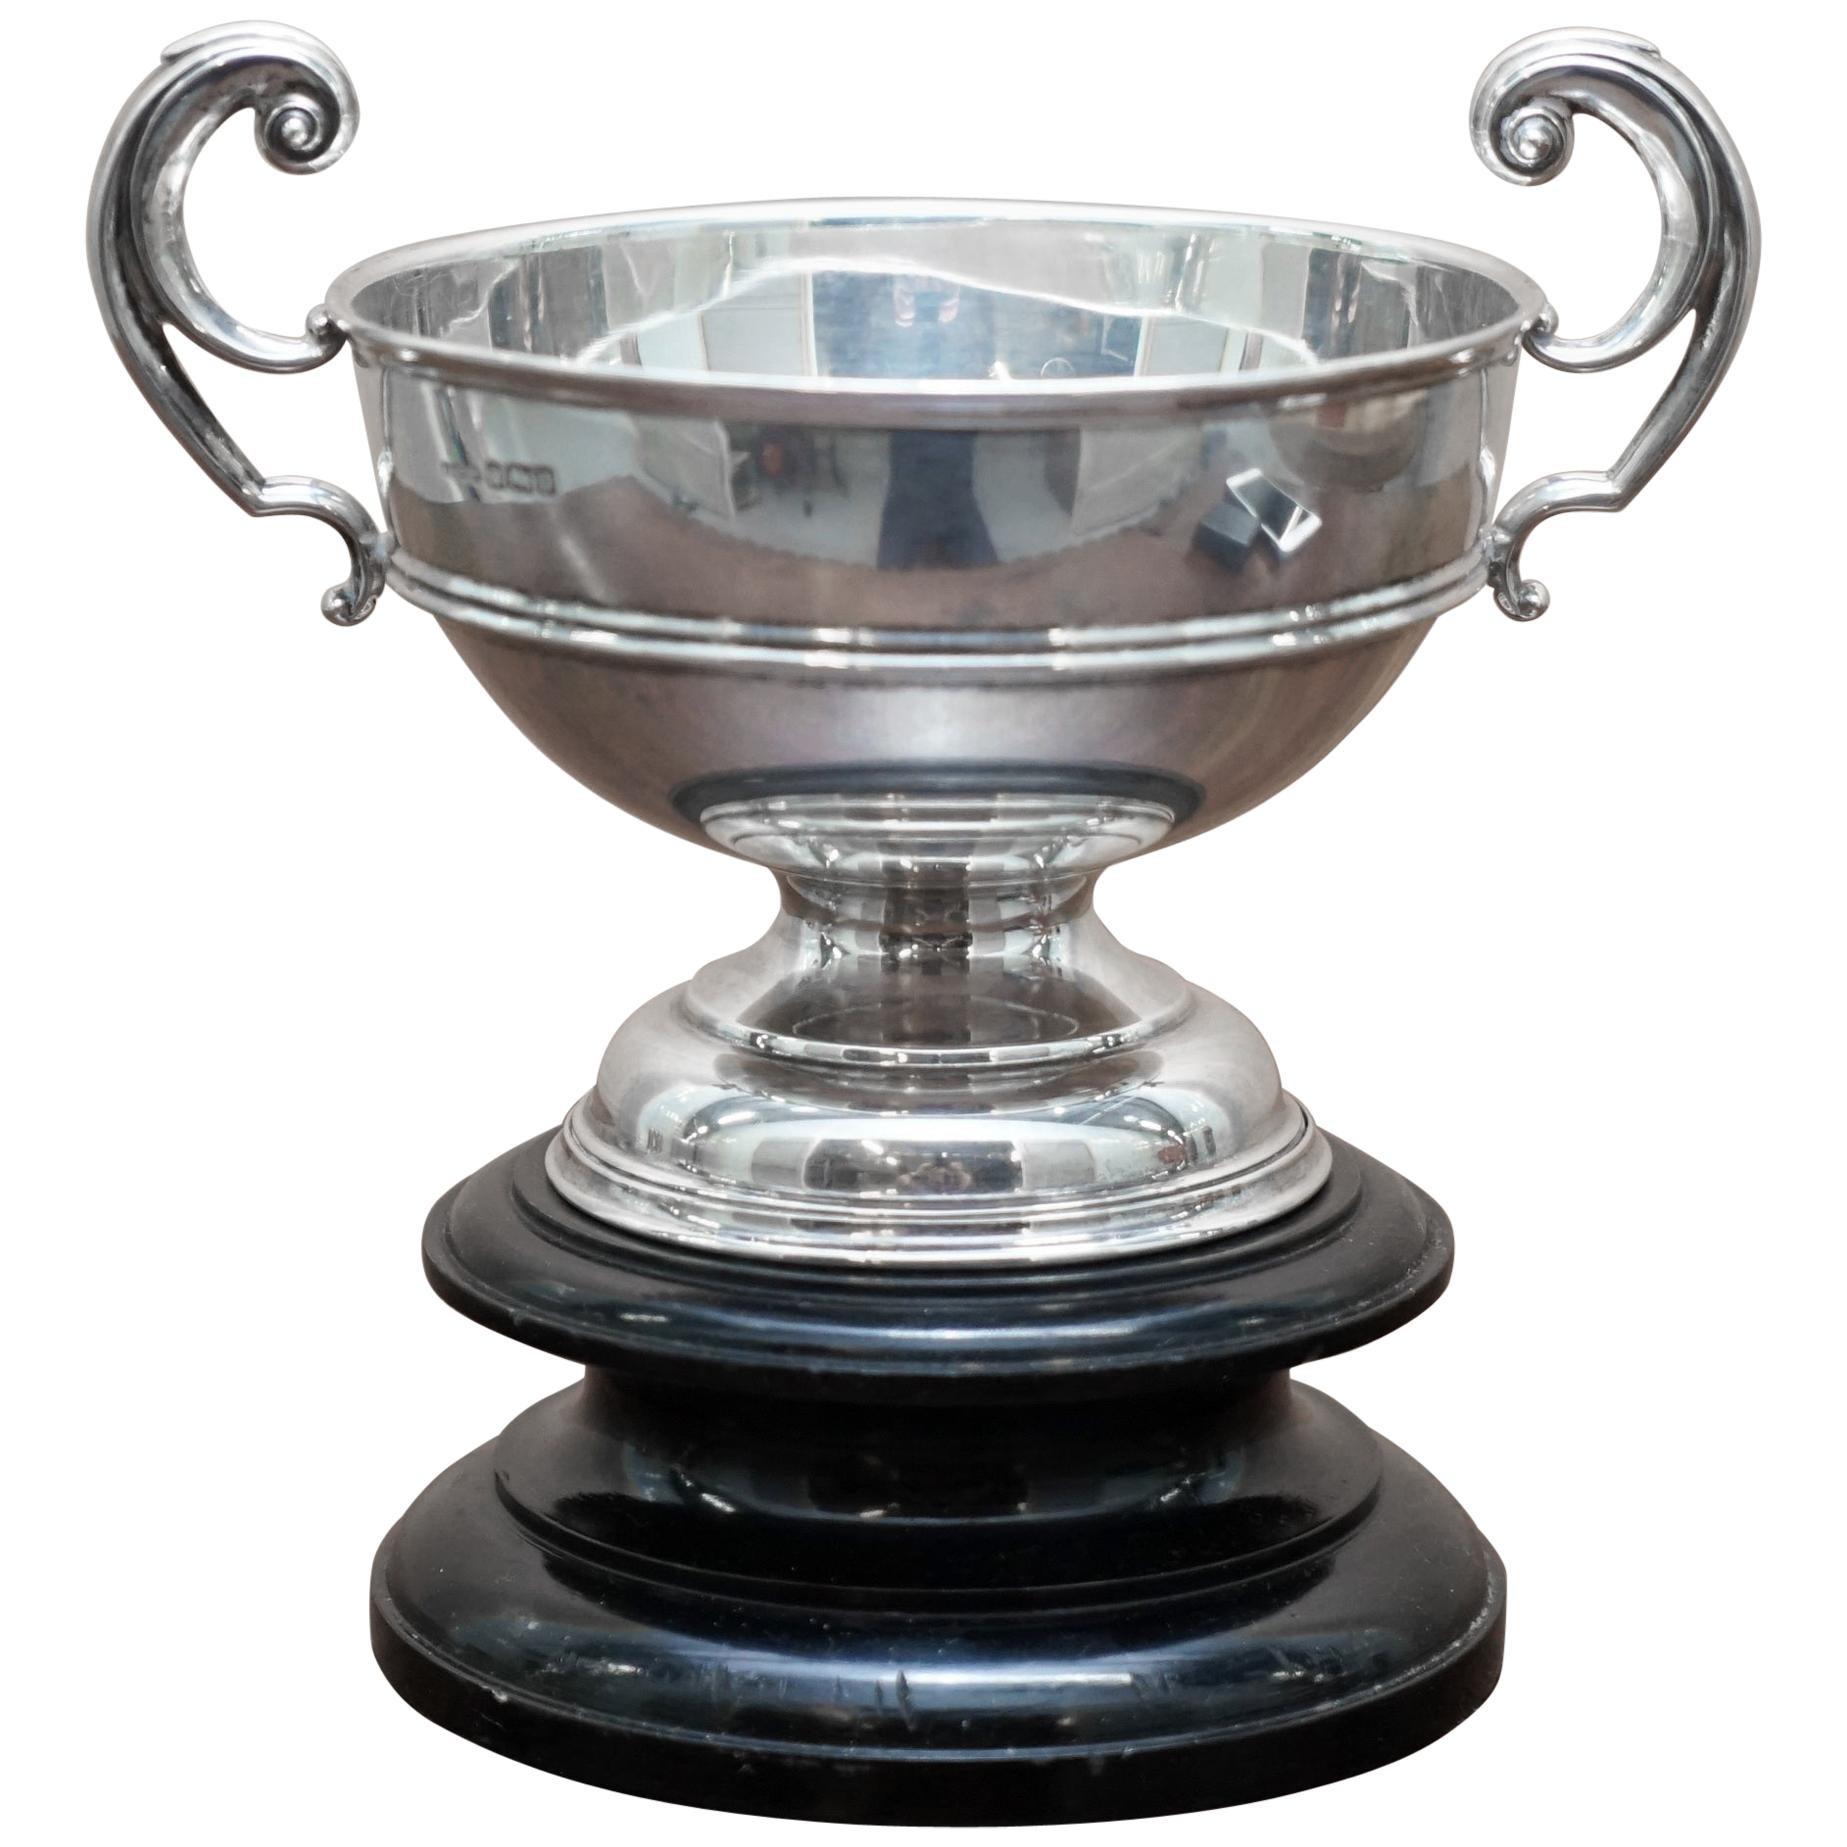 Stunning Asprey & Co Ltd Trophy Cup & Base Sterling Silver Fully Hallmarked 1907